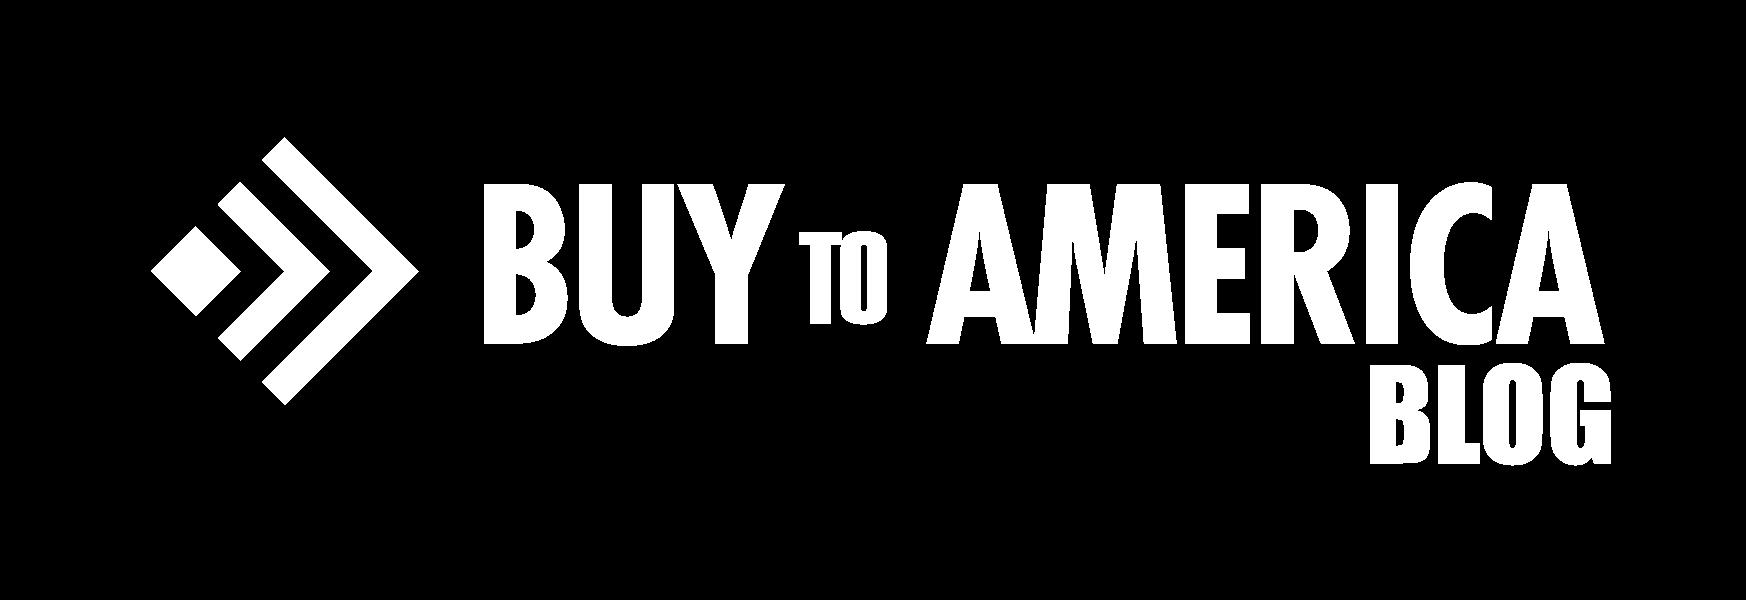 BuyToAmerica Blog